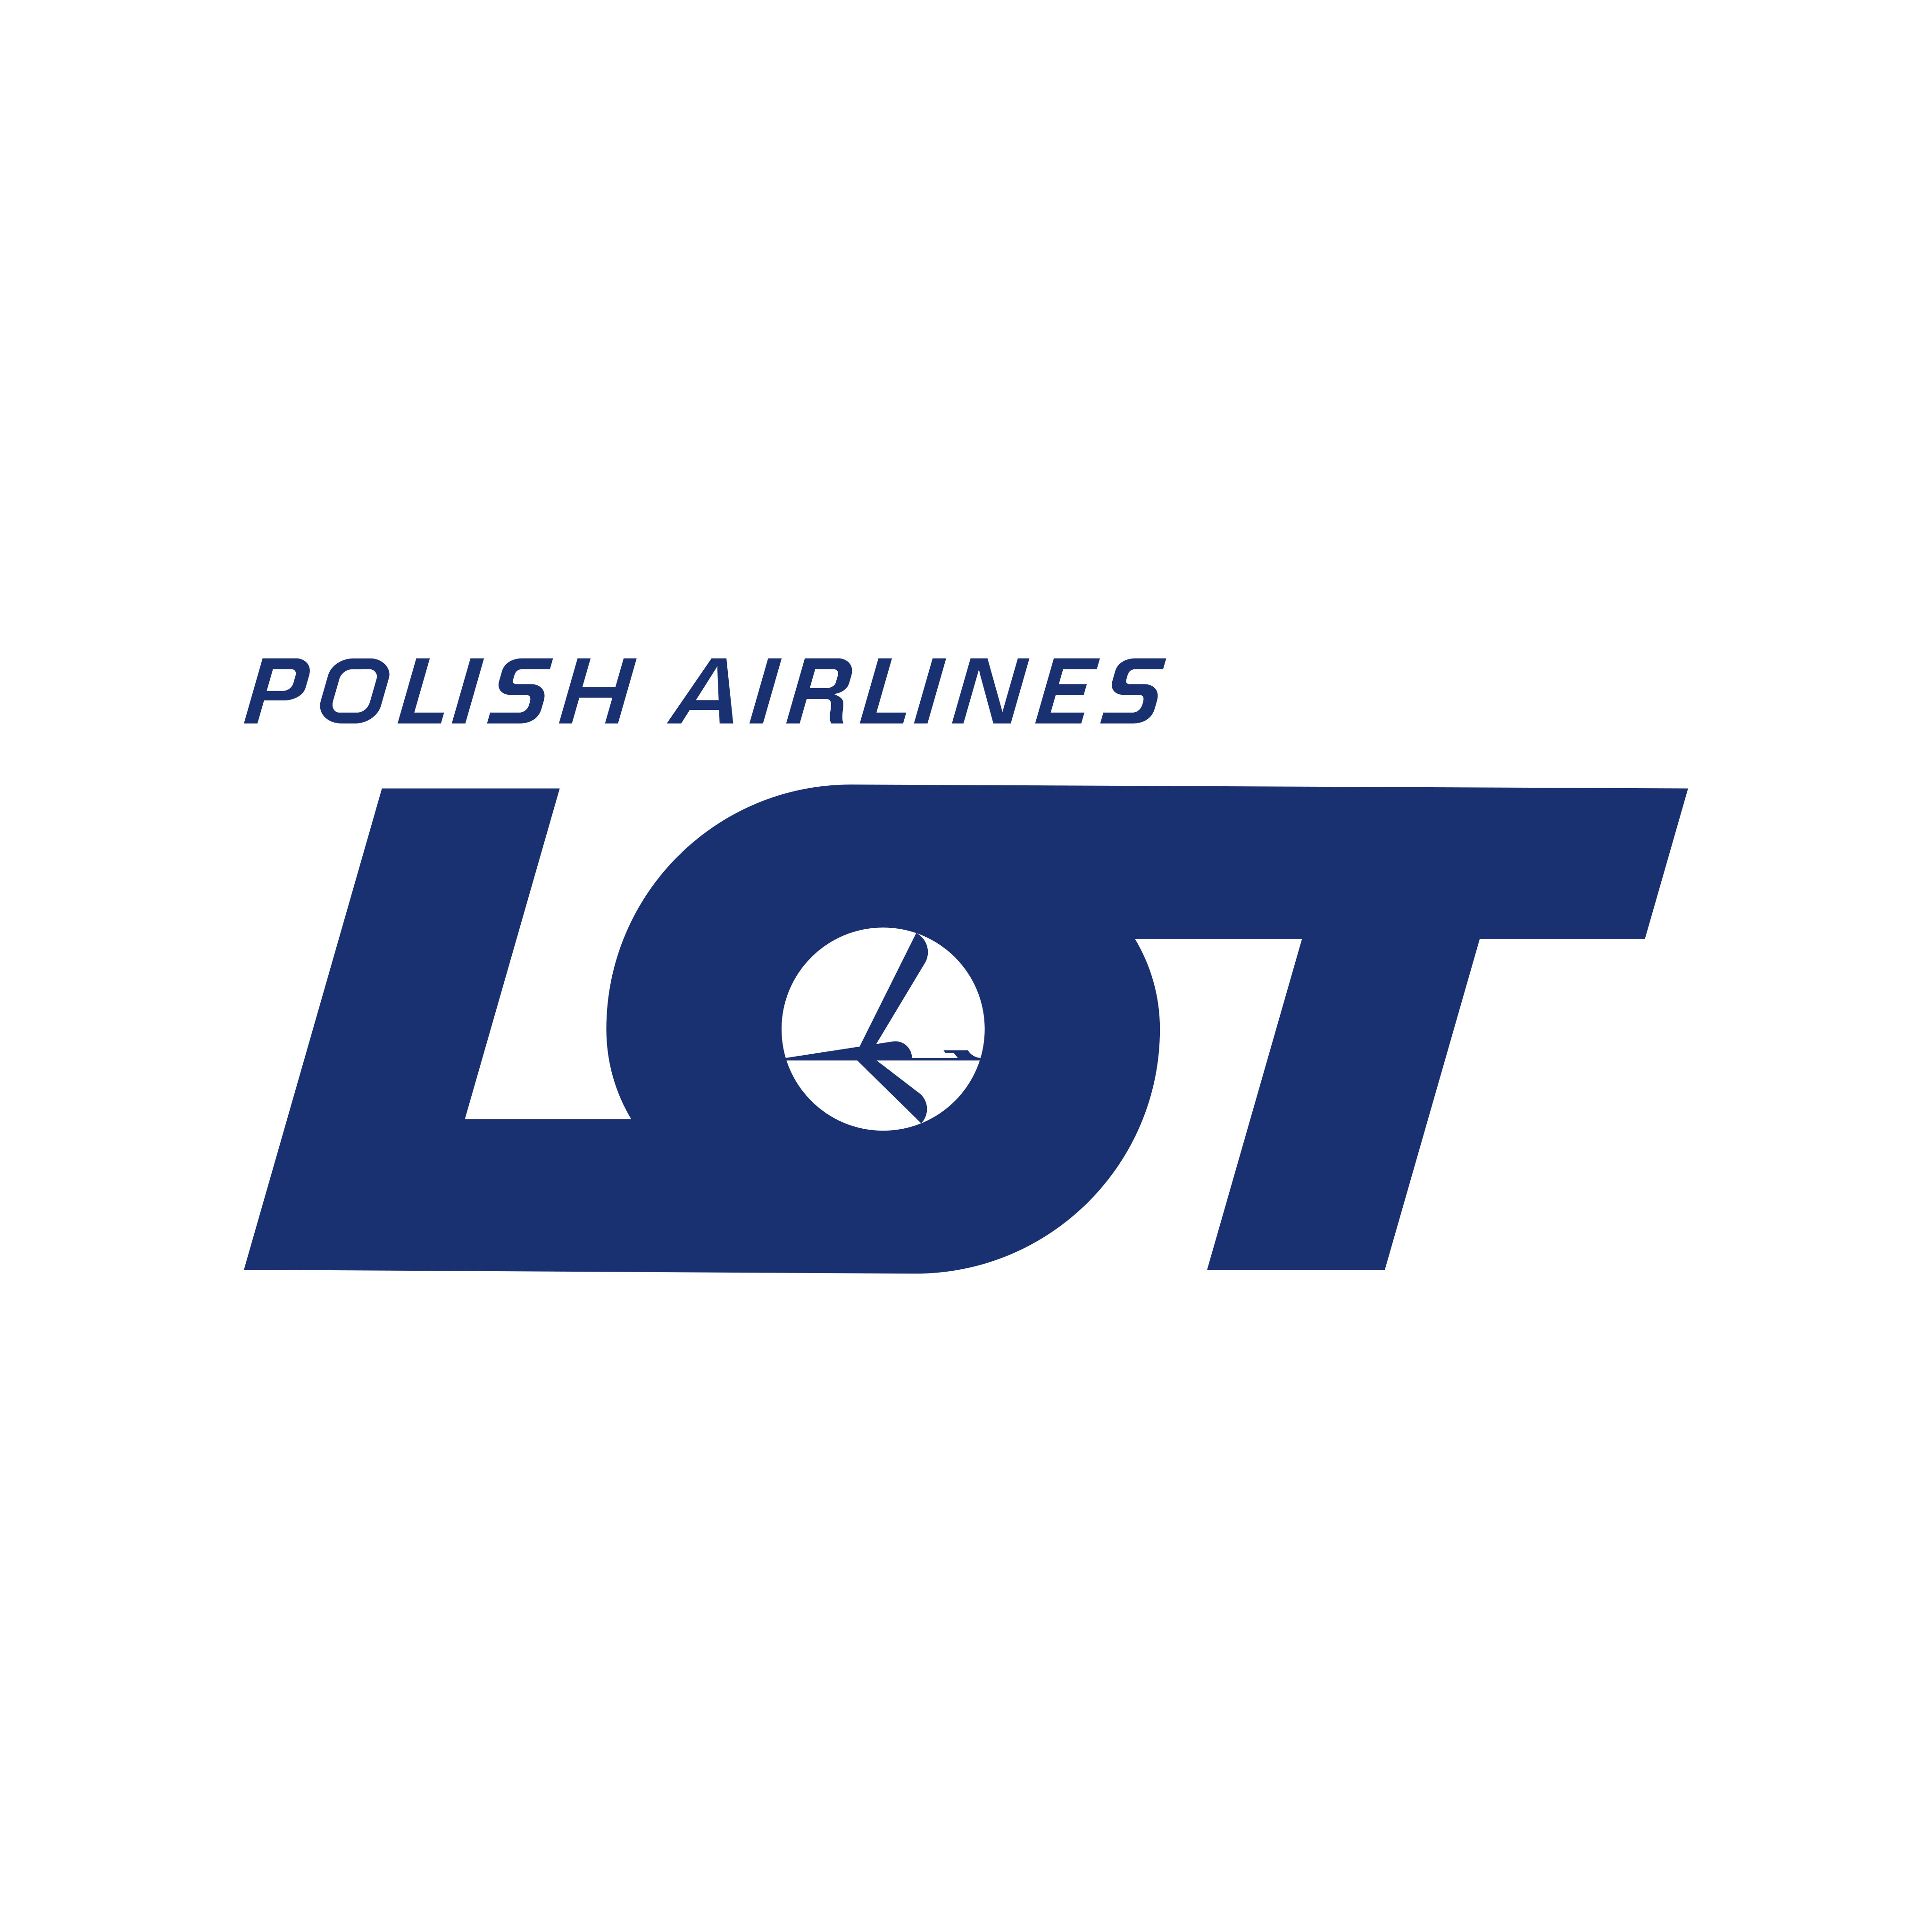 lot polish airlines logo 0 - LOT Polish Airlines Logo